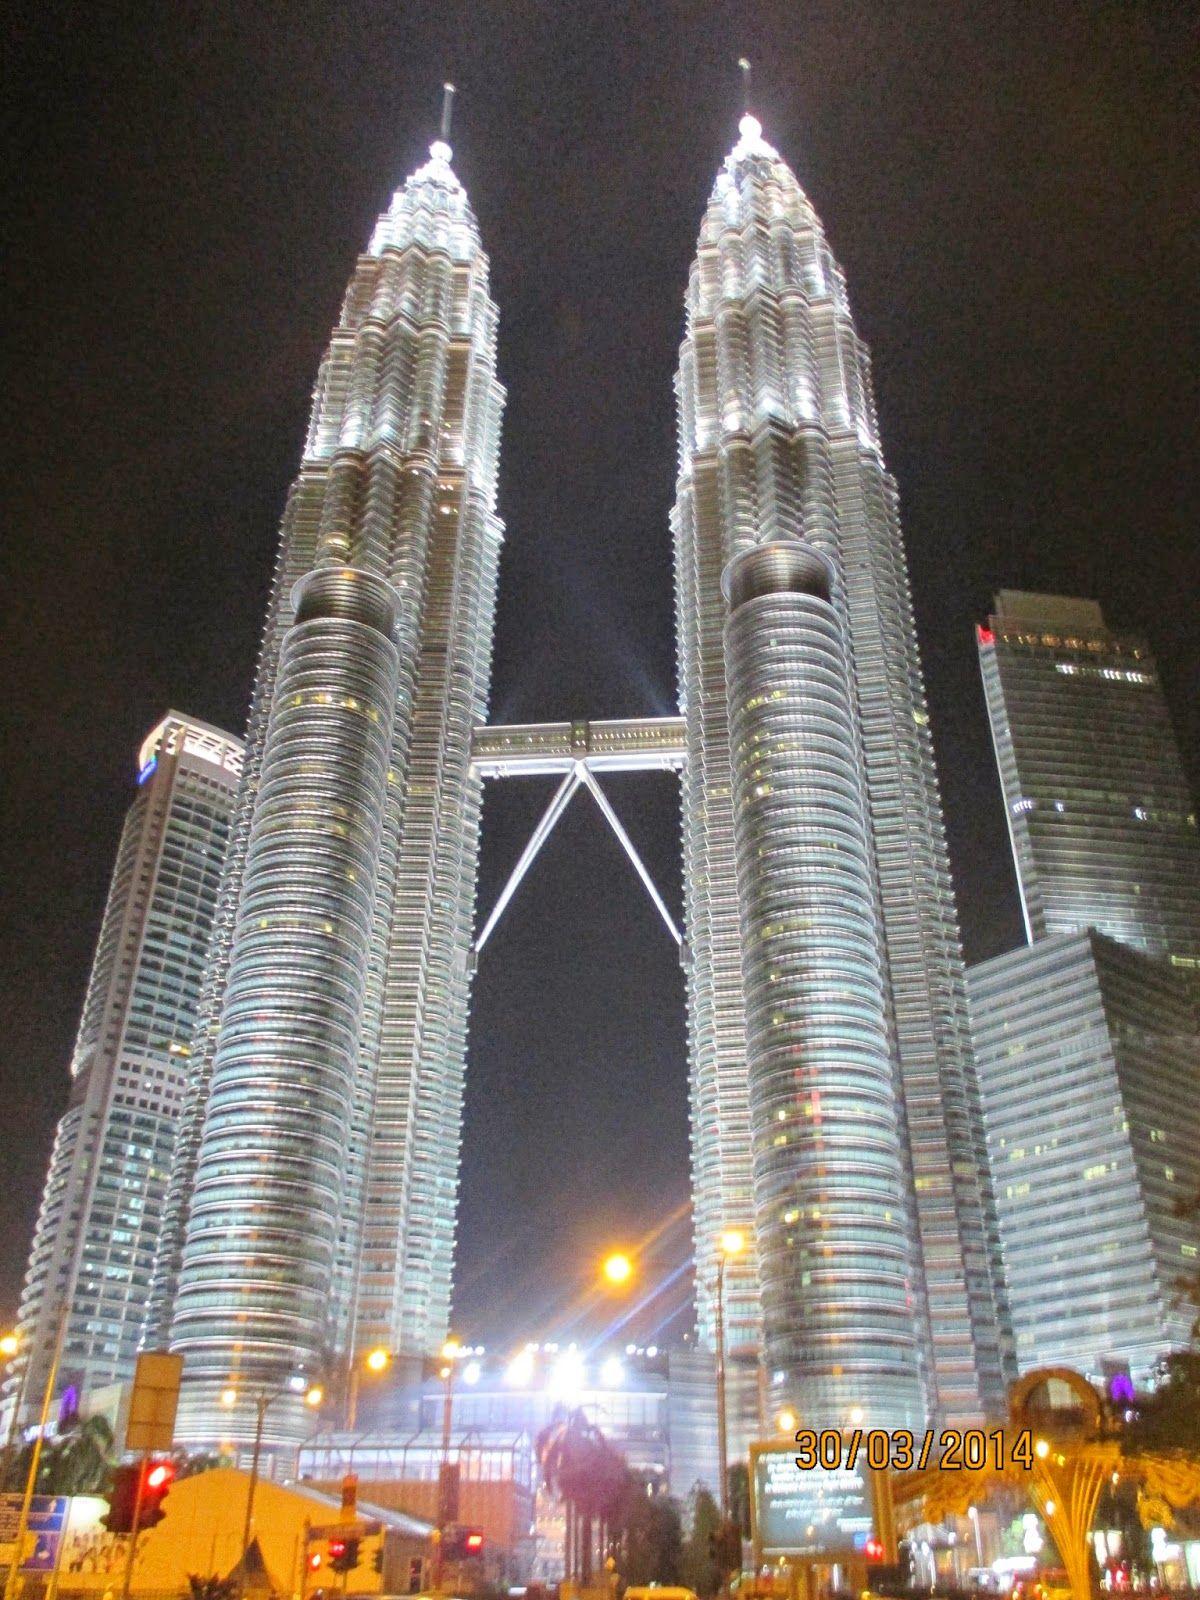 Kuala Lumpur http://apenmatkat.blogspot.fi/p/kuala-lumpur.html